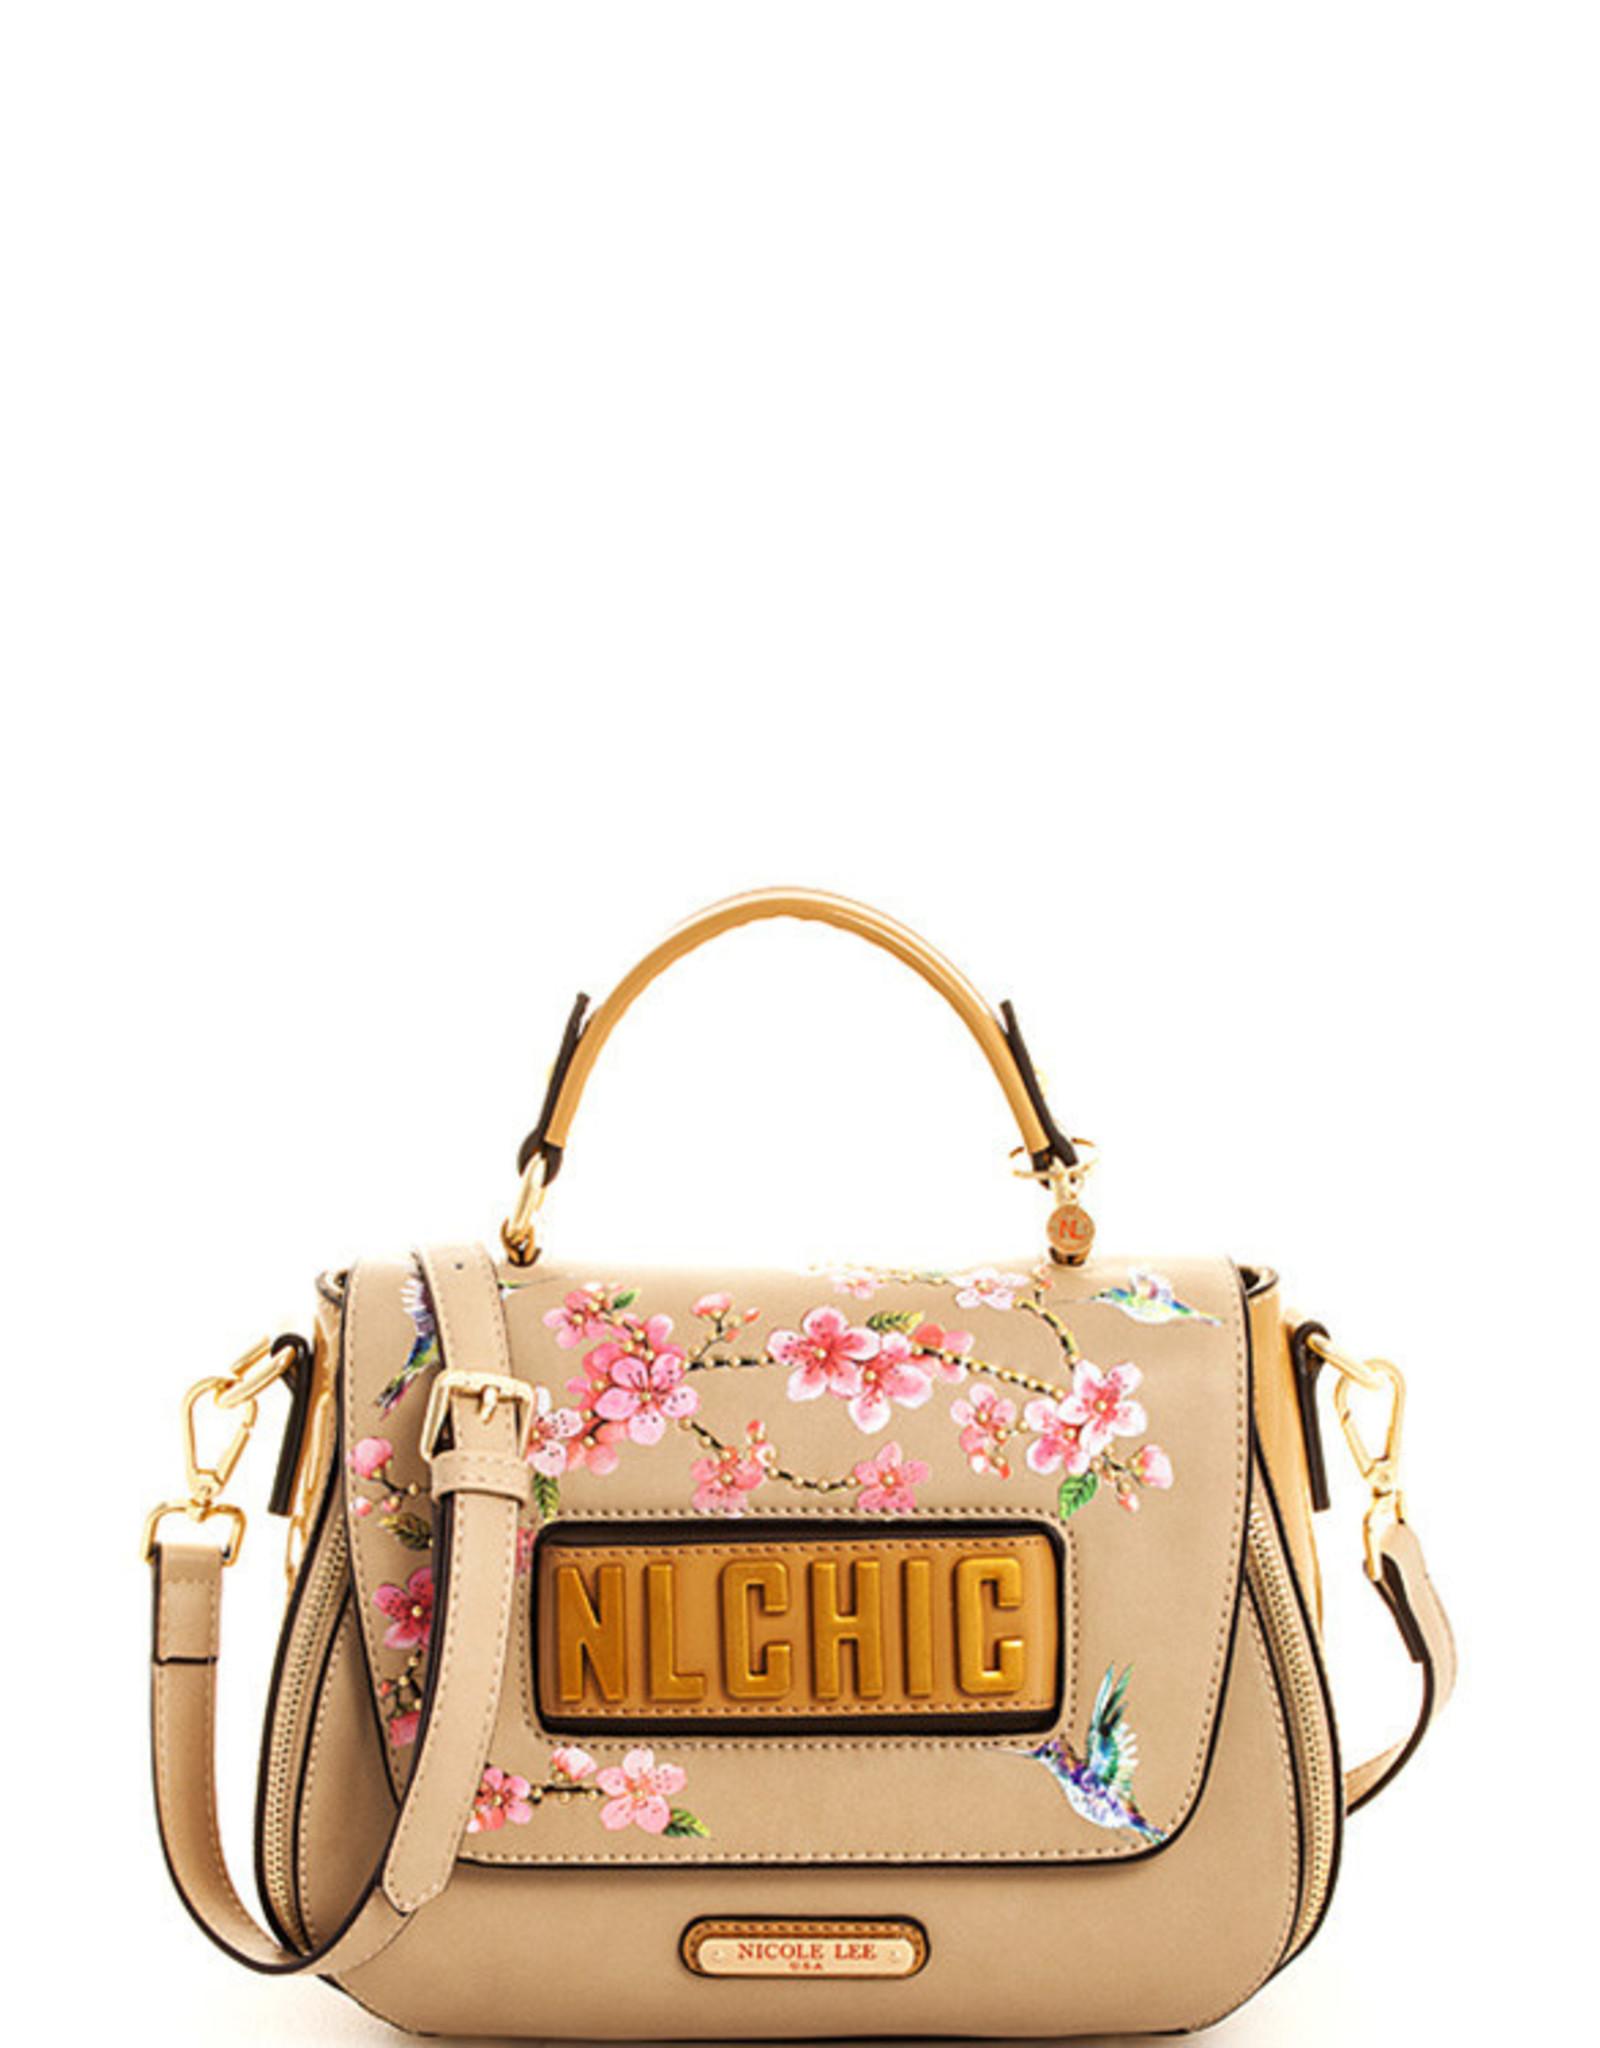 Nicole Lee CHERRY BLOSSOM EXPANDABLE CROSSBODY BAG